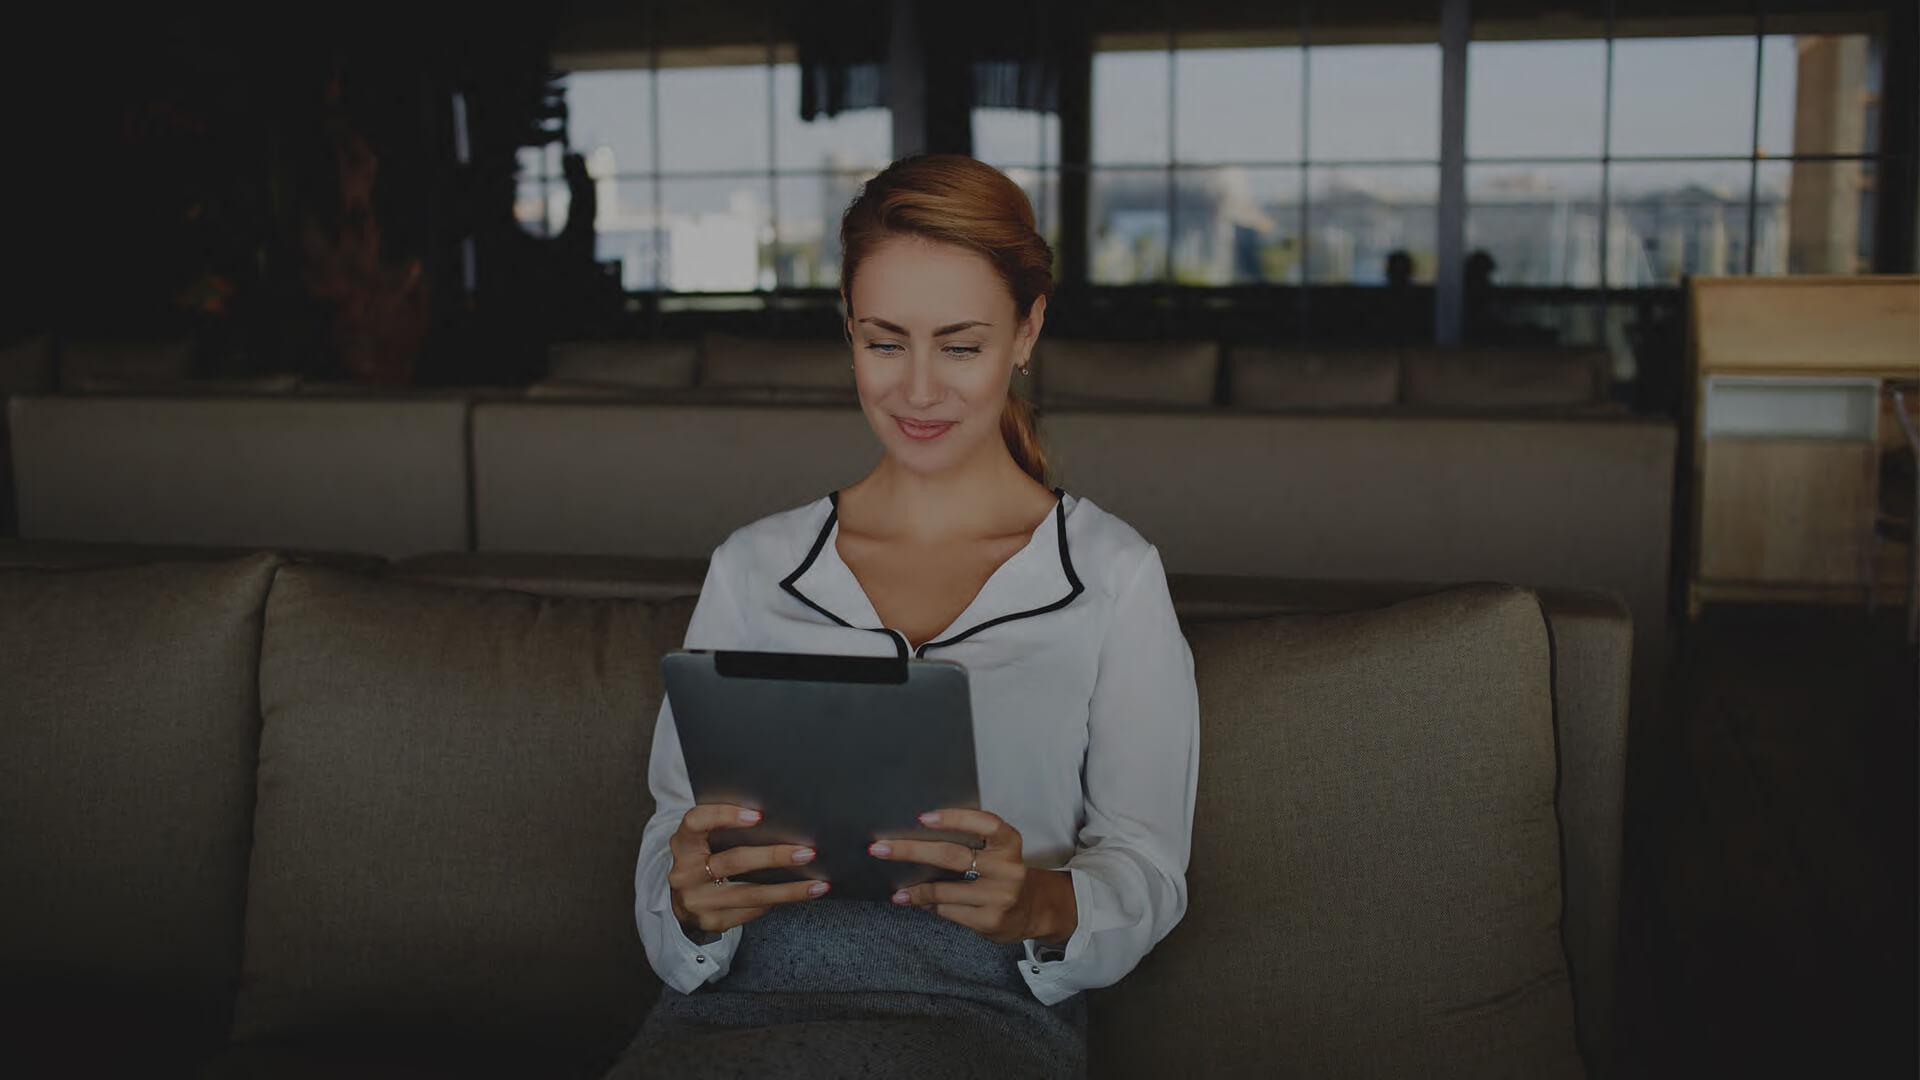 Landing Page Image - Woman iPad Compressed.jpg